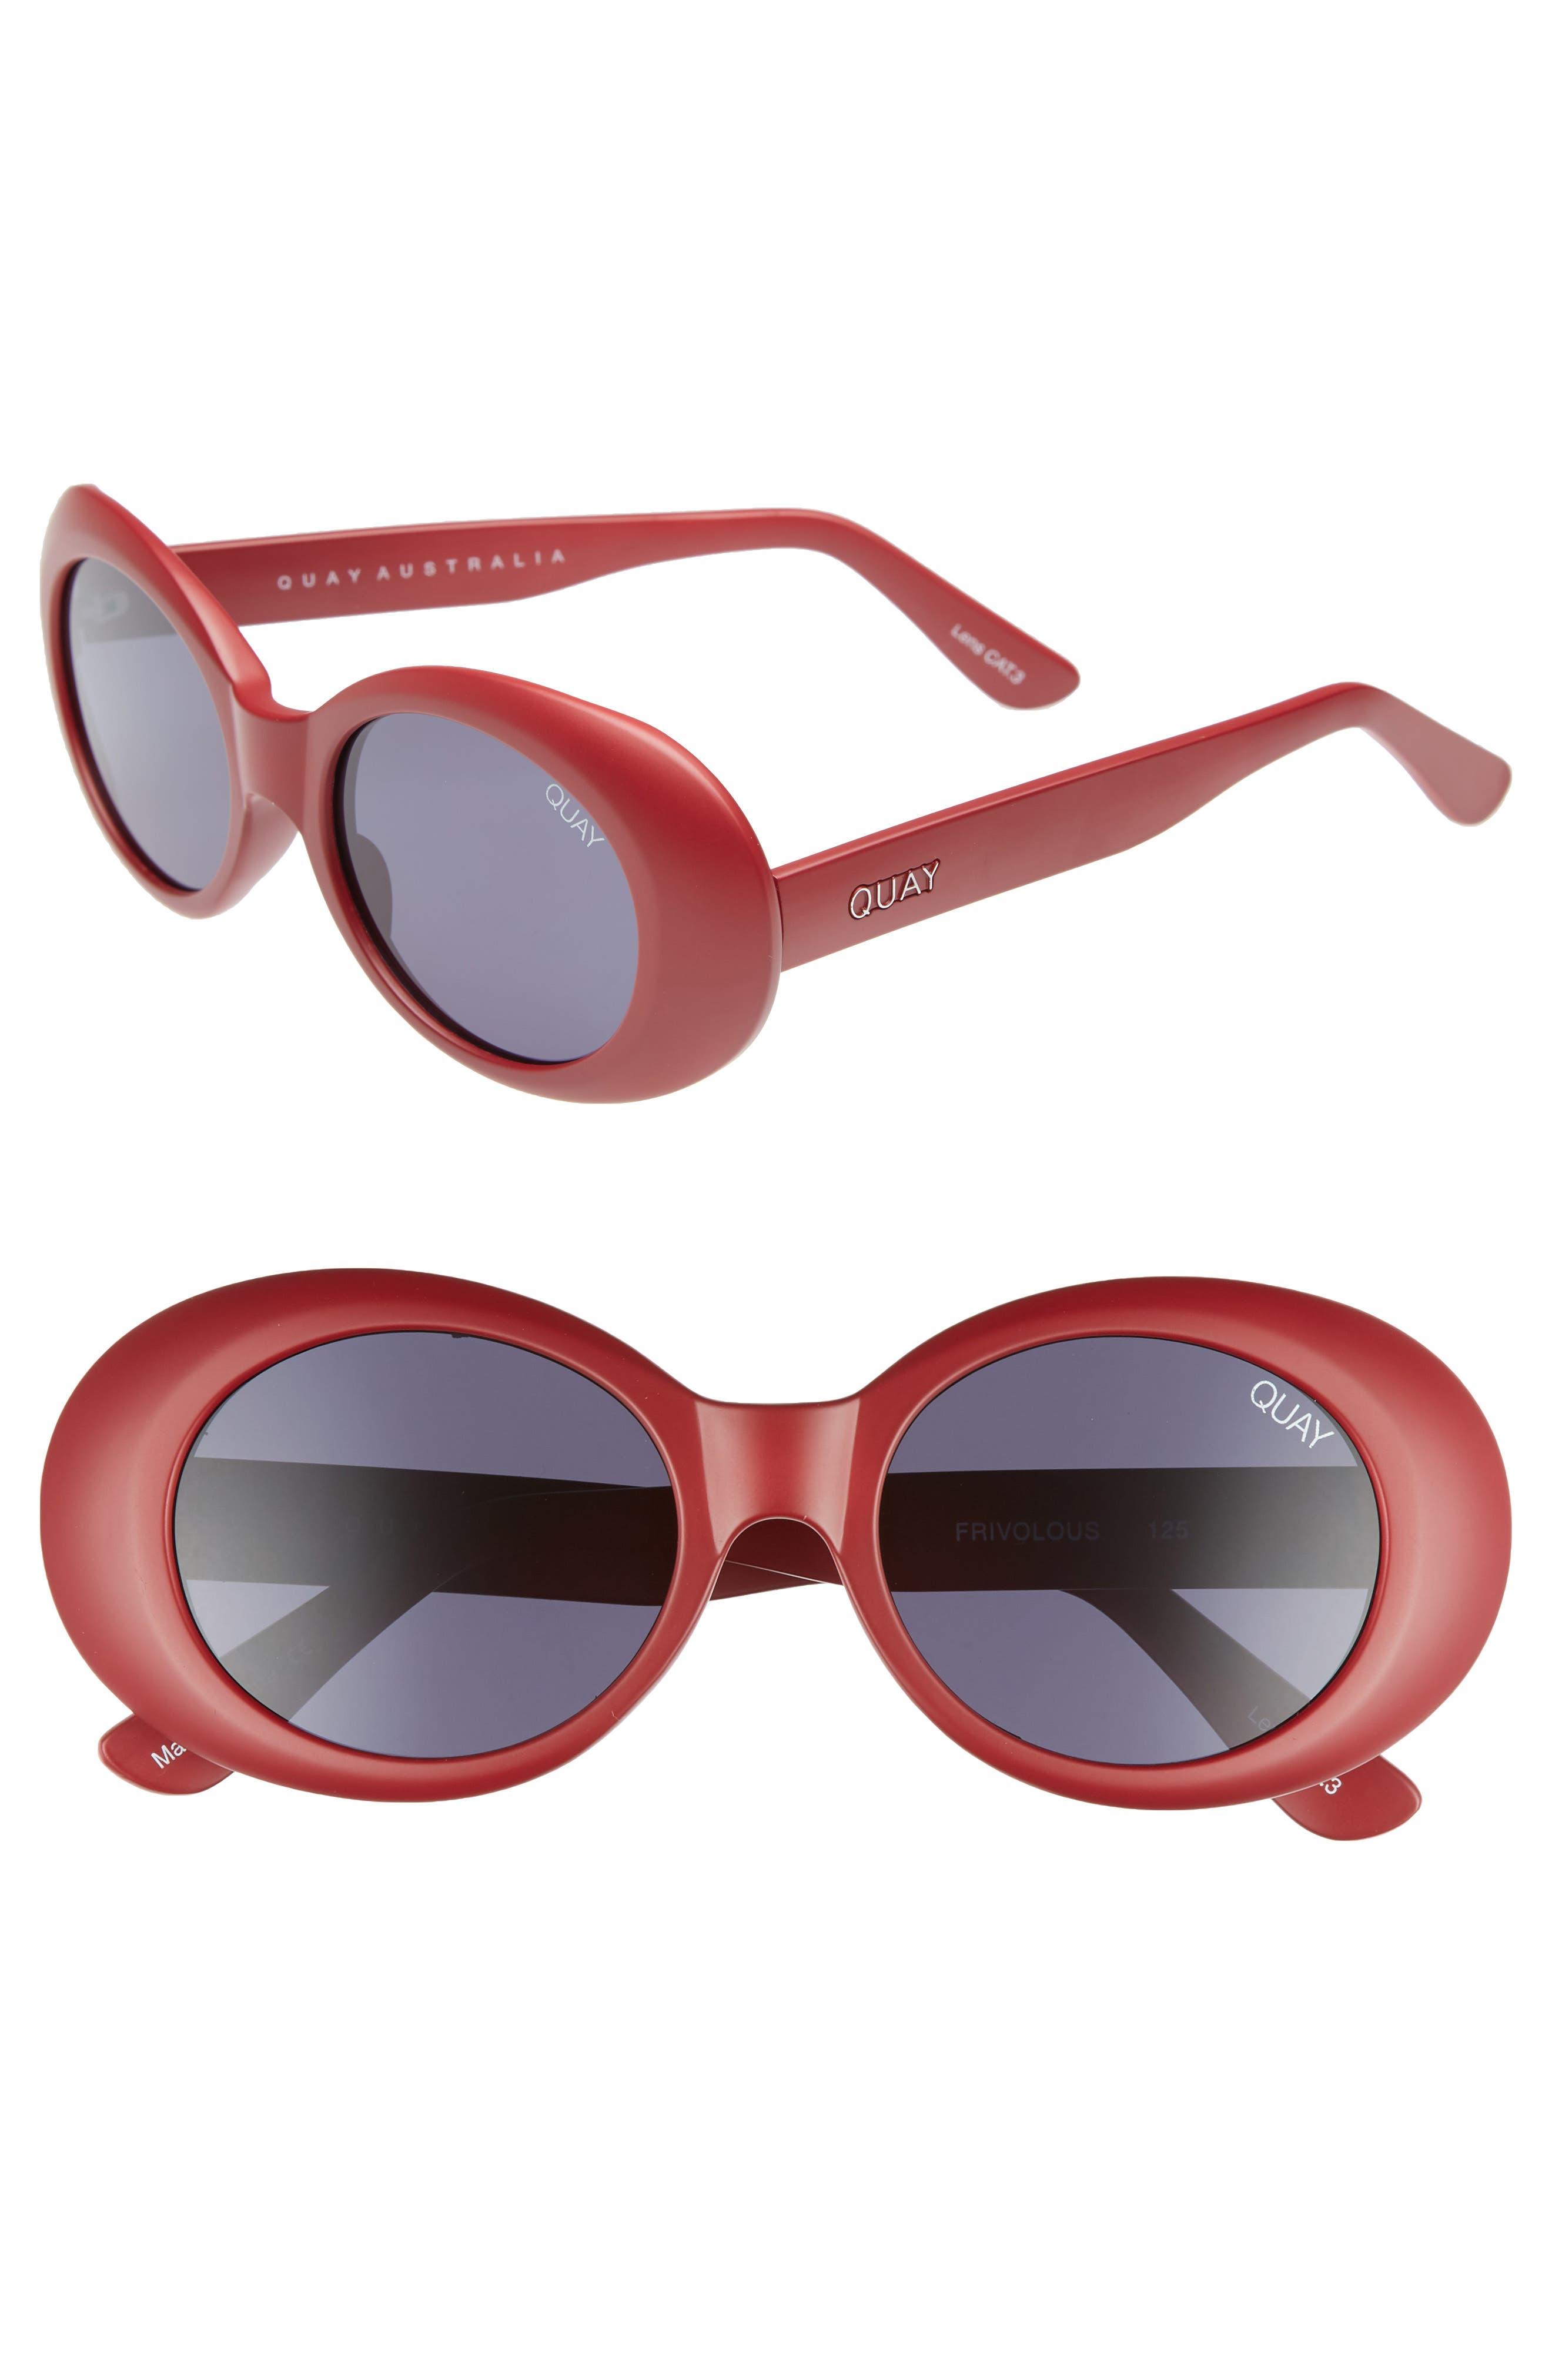 Frivolous 50mm Oval Sunglasses,                         Main,                         color, Red/ Smoke